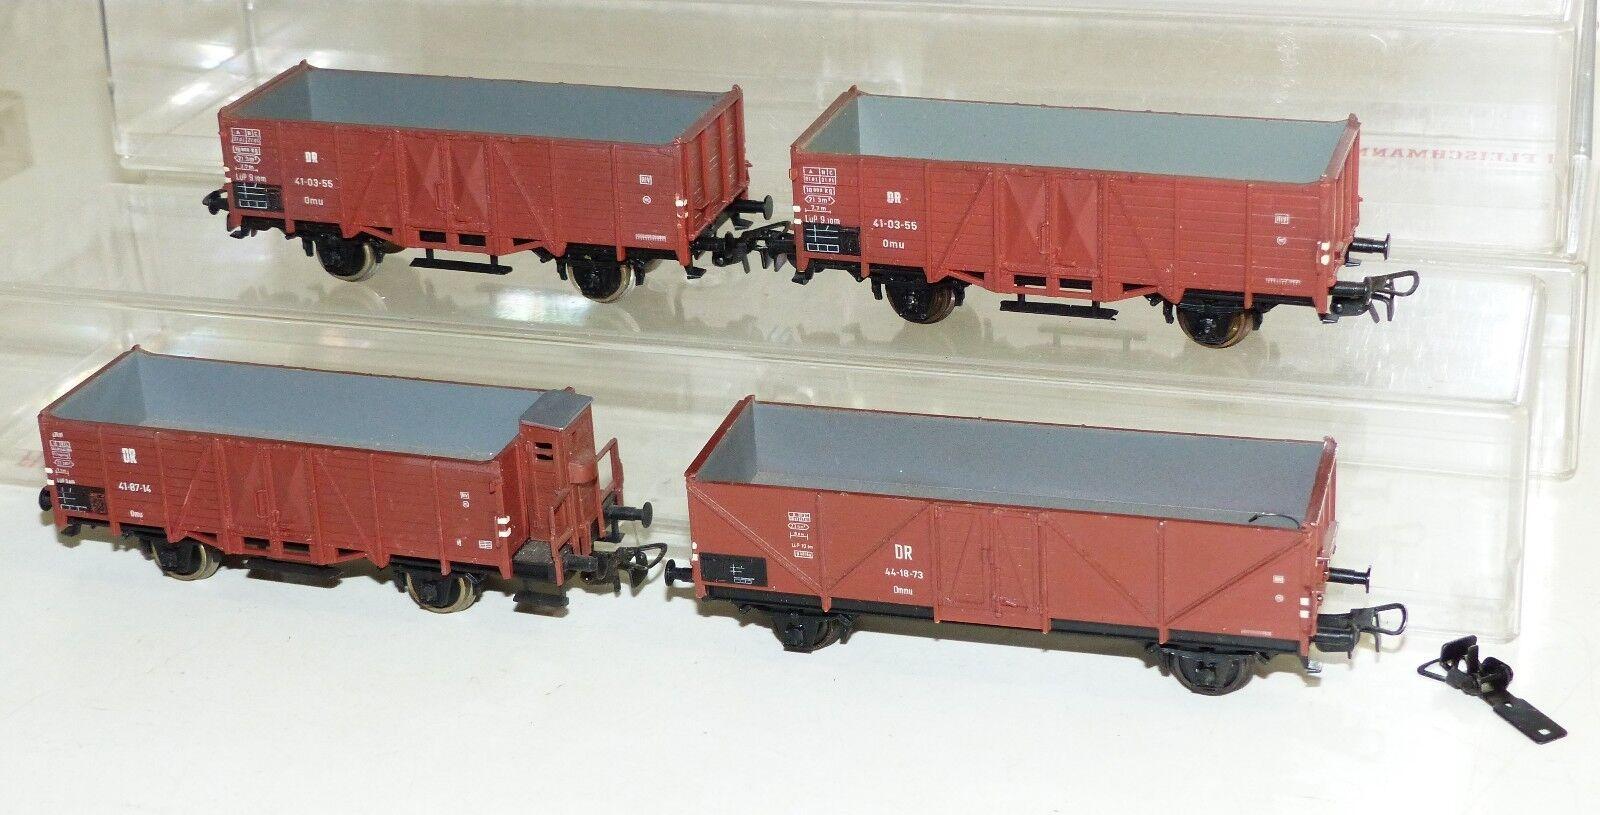 4x Piko Hochbordwagen DR  41-87-14 Bremserhaus, 44-18-73, 2x 41-03-55 H0